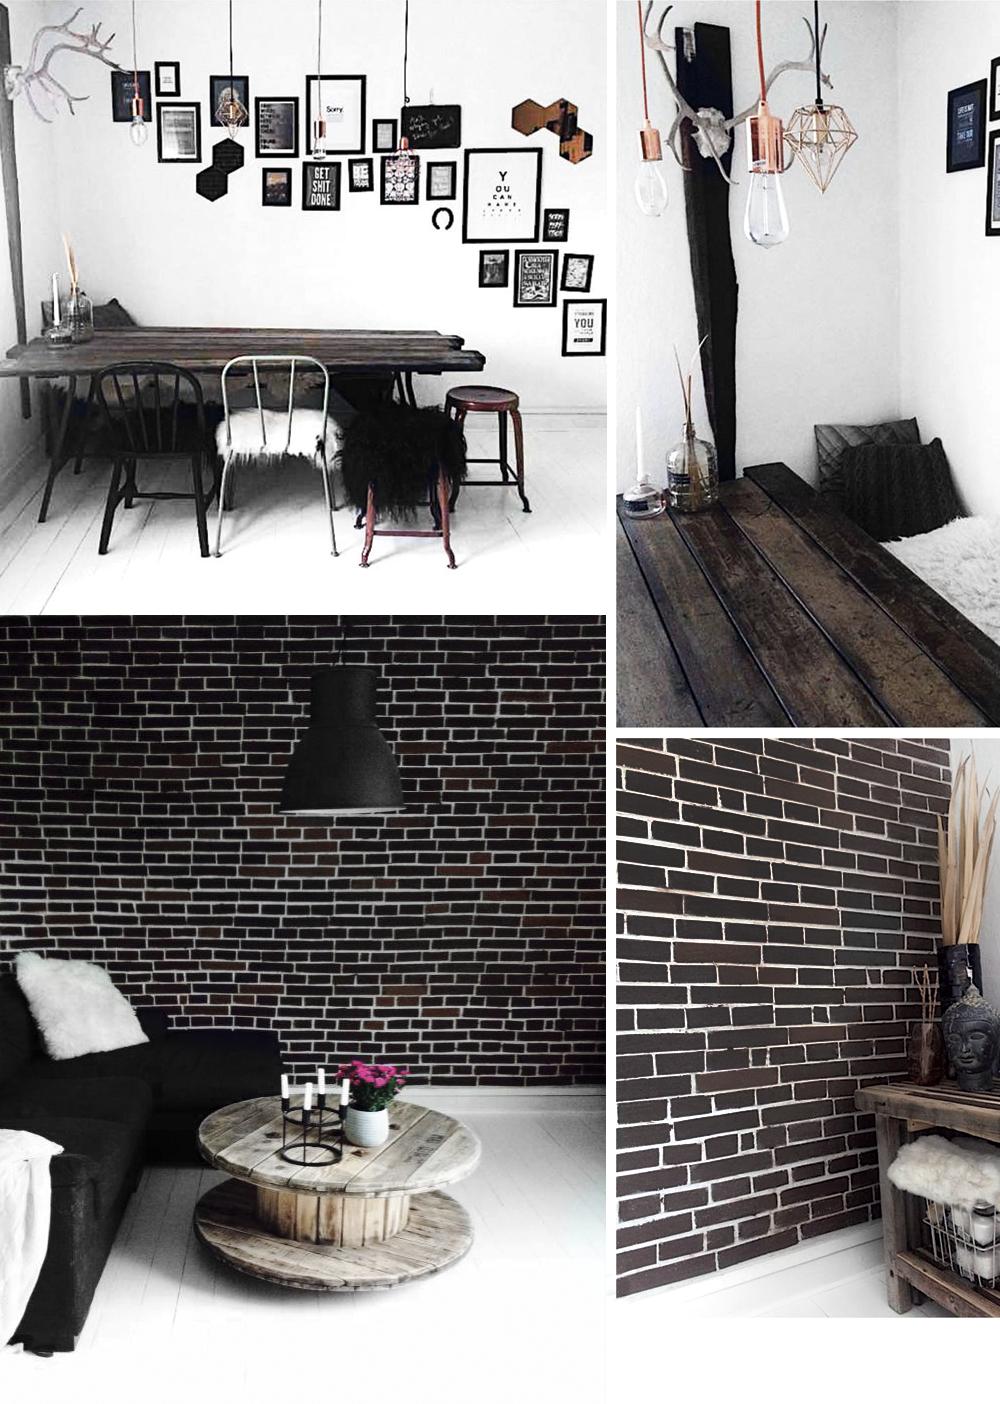 brickwall02